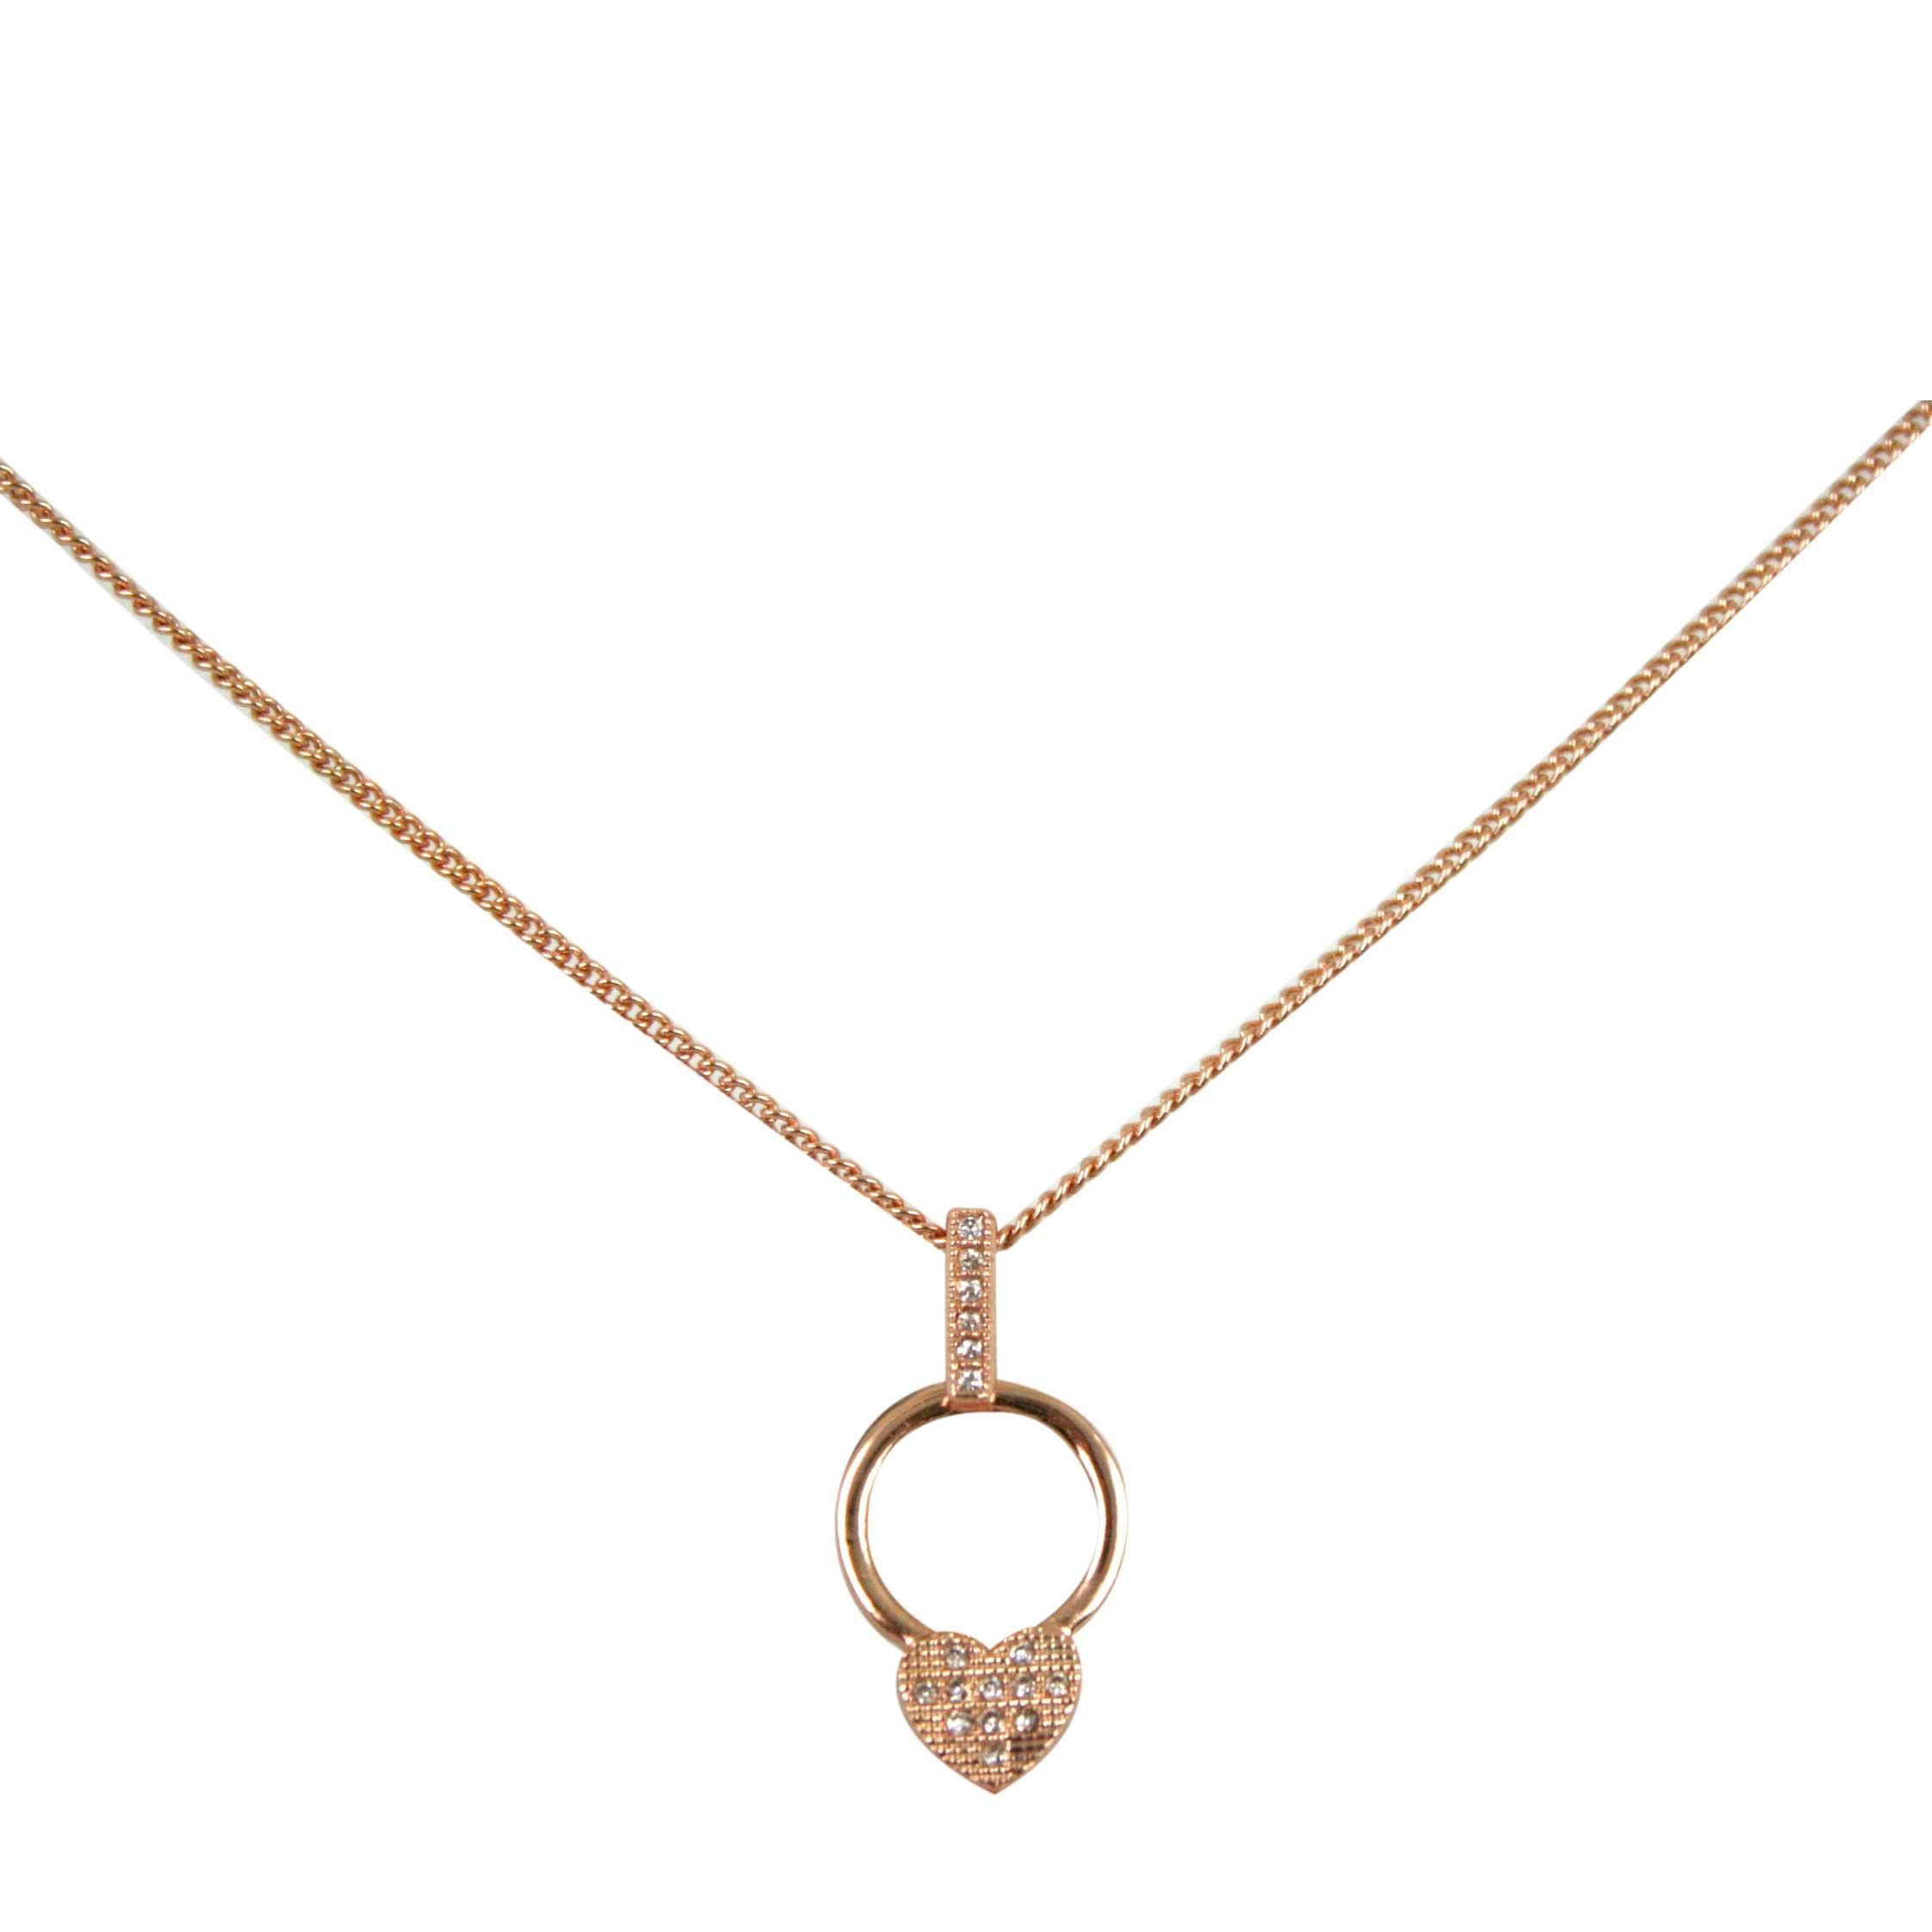 Georgia love pendant